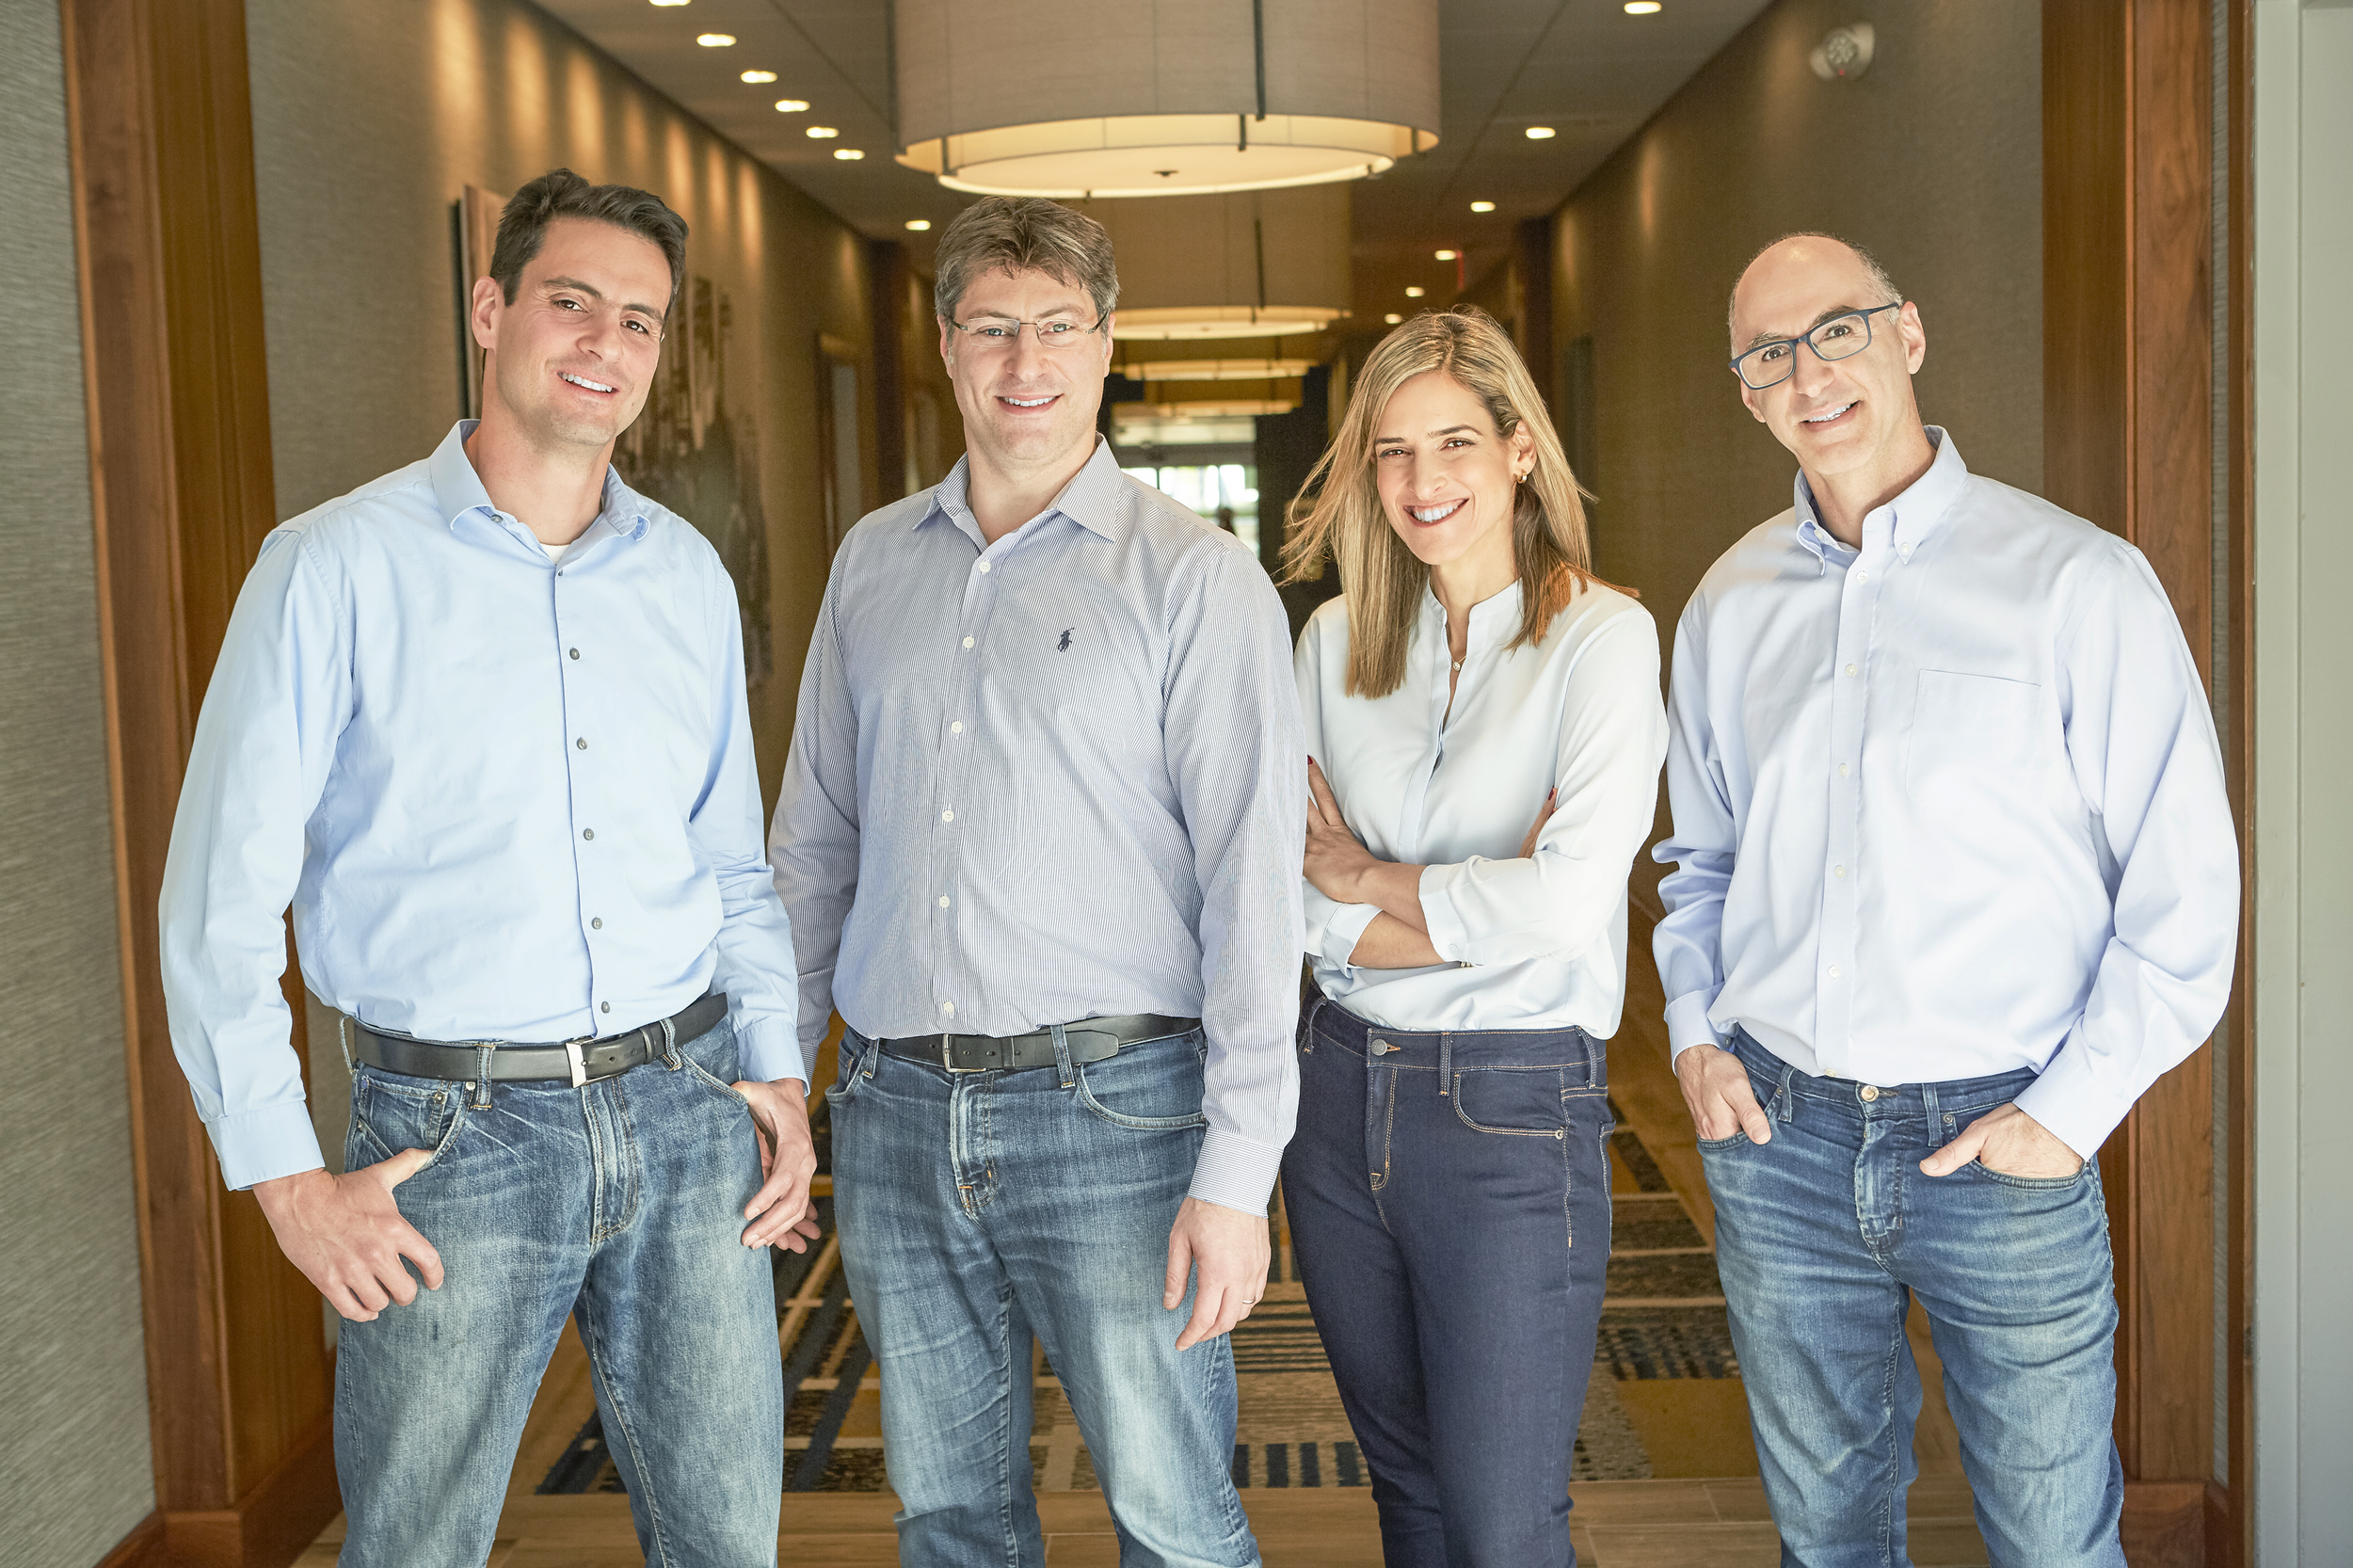 Sunbit co-founders. Photo: Courtesy